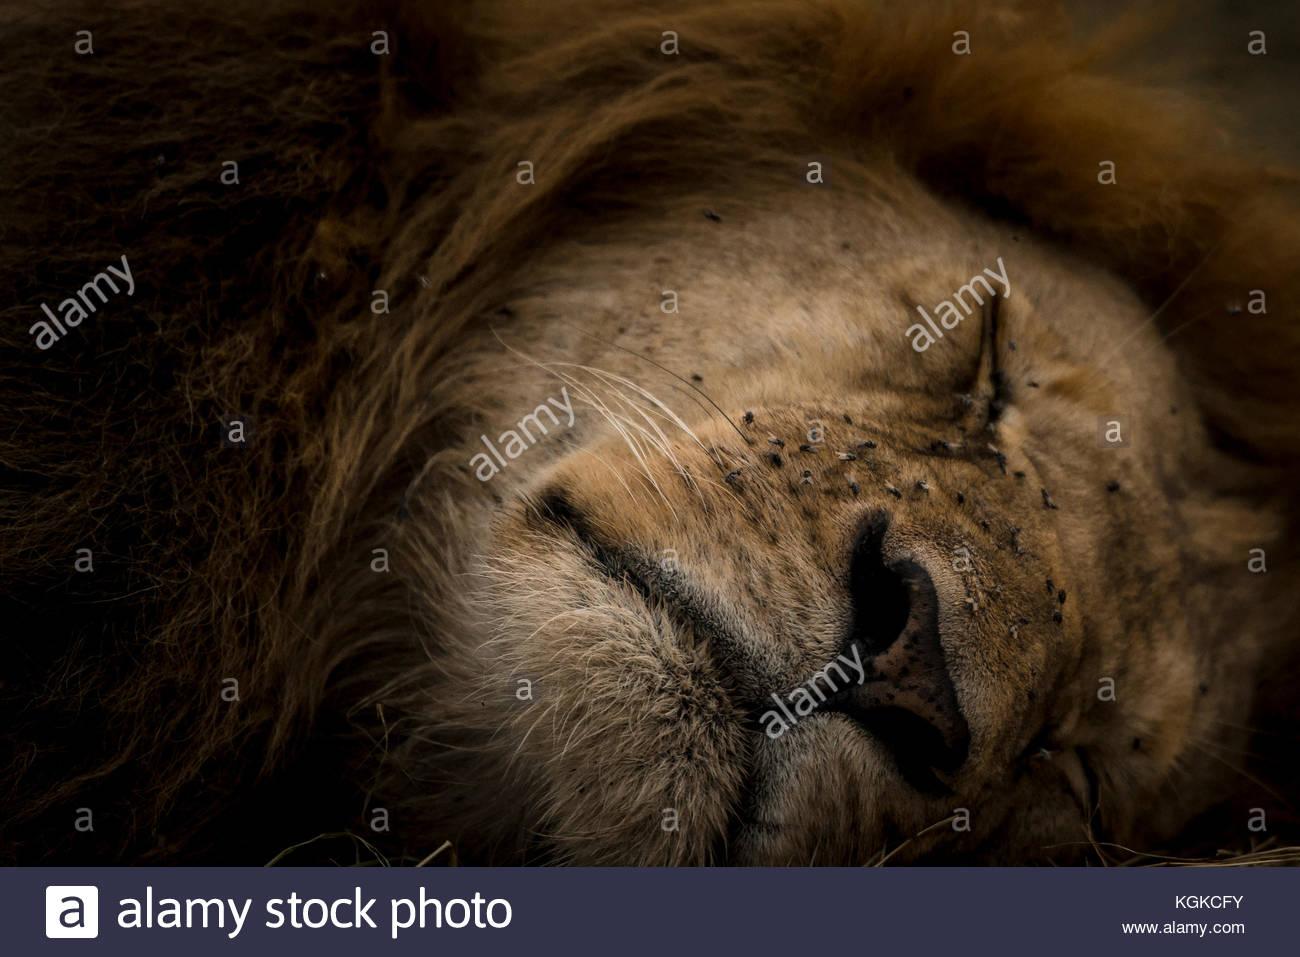 Porträt eines Sleepy Lion, Panthera leo, Masai Mara National Reserve. Stockbild